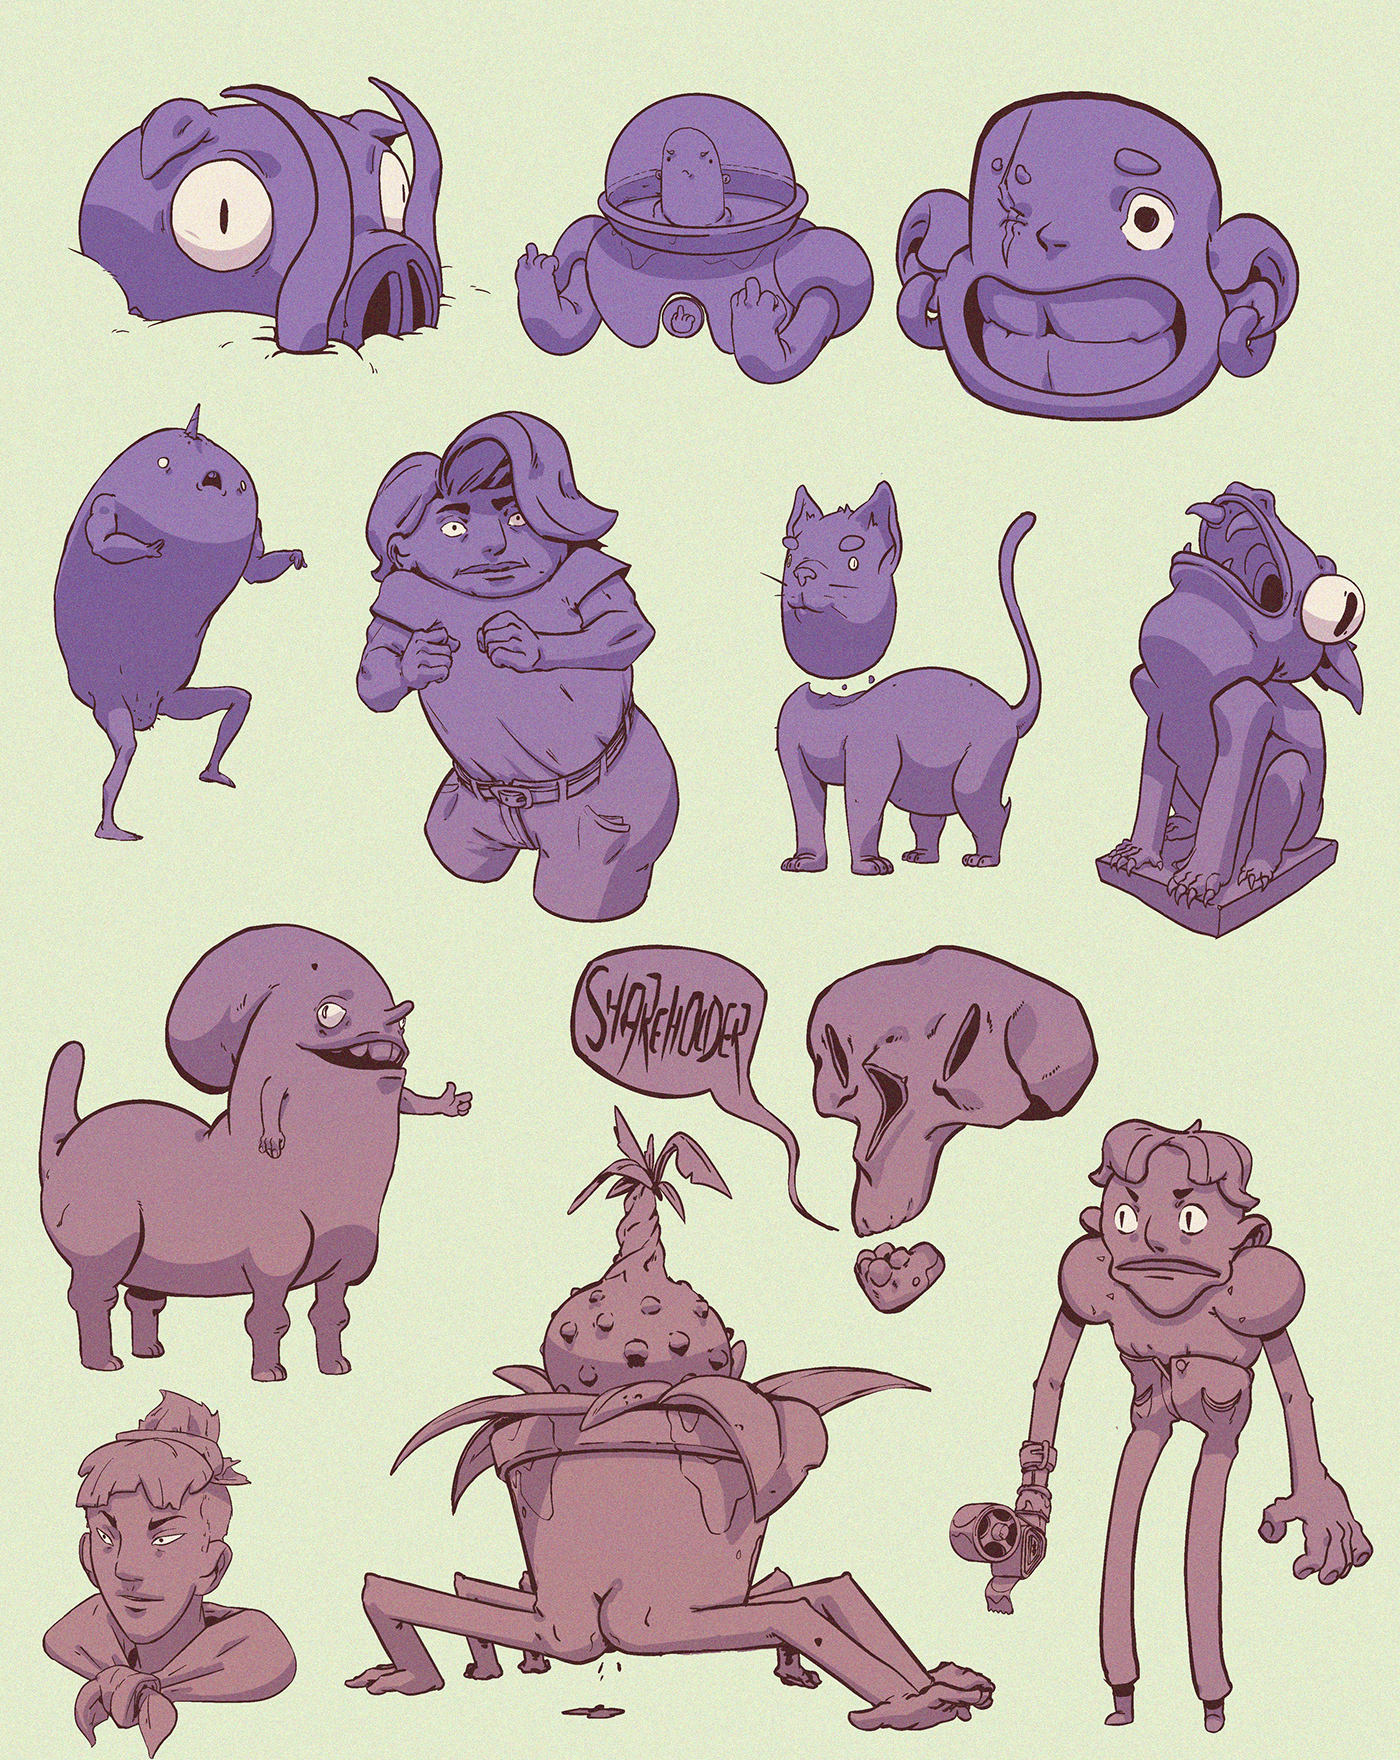 Image may contain: cartoon, animal and book